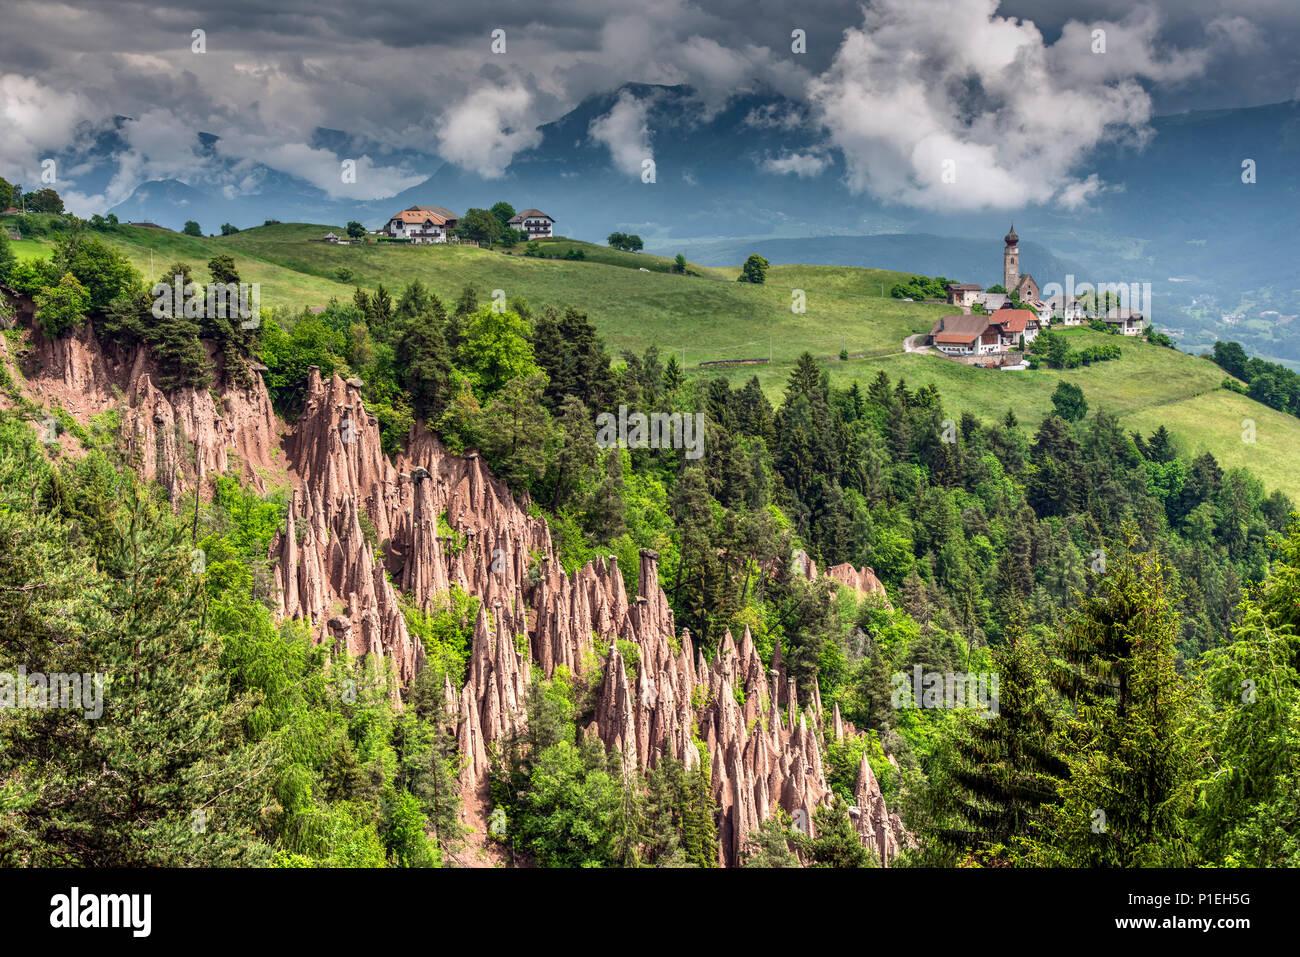 Earth pyramids, Renon - Ritten, Trentino Alto Adige - South Tyrol, Italy - Stock Image